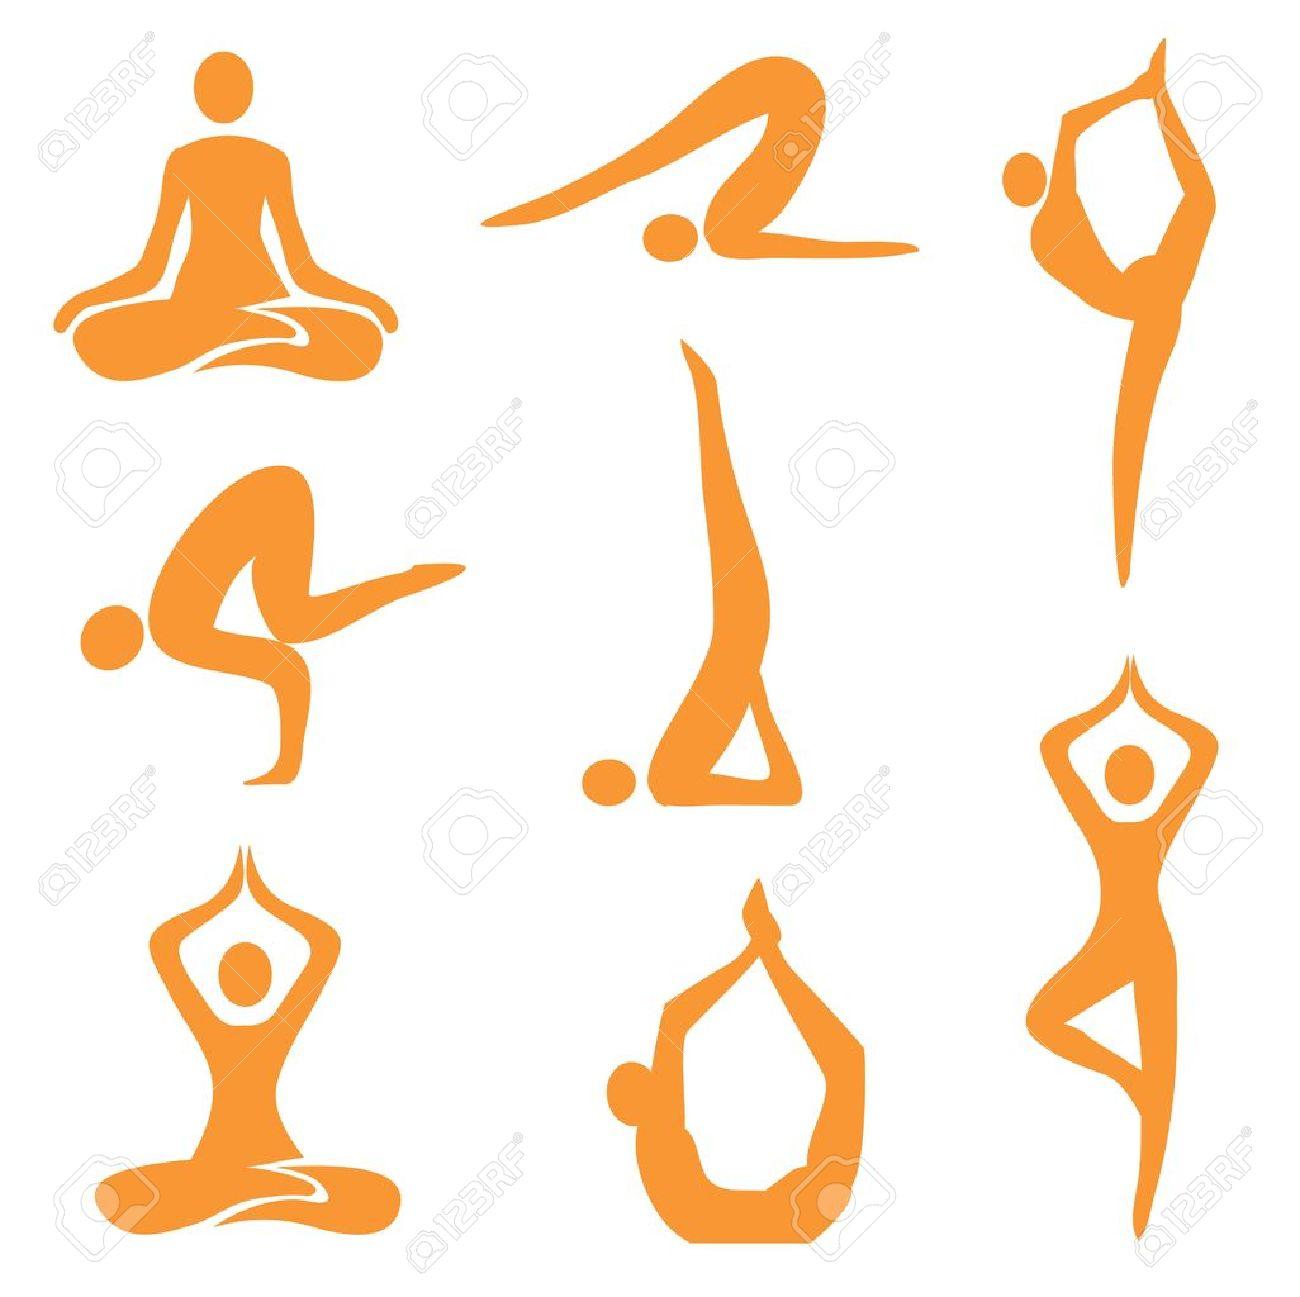 Yoga übungen Lizenzfreie Vektorgrafiken Kaufen: 123RF